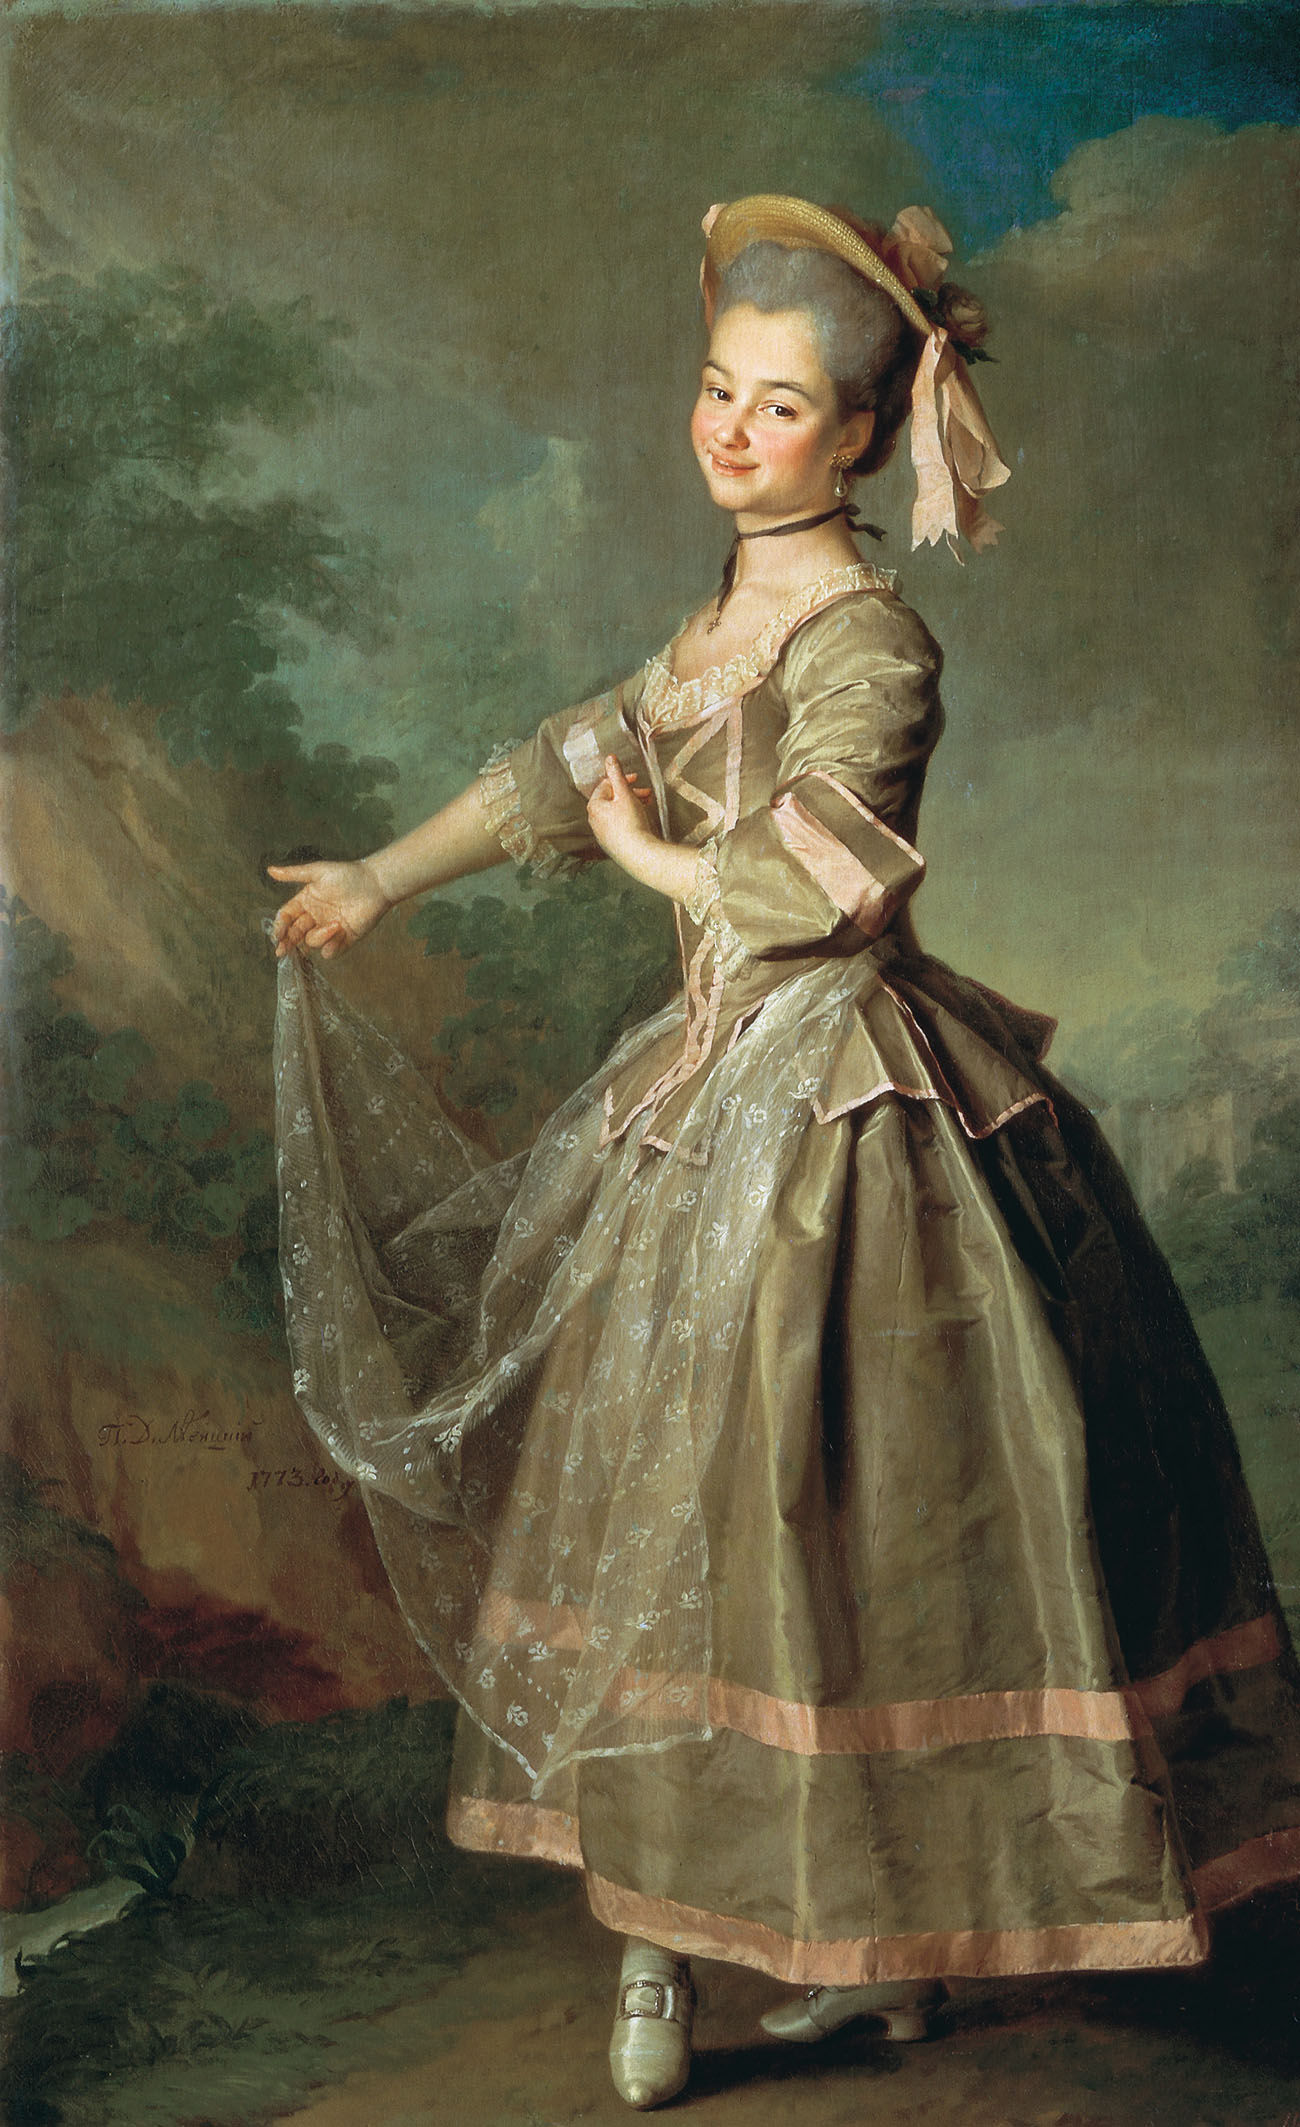 Ekaterina Ivanovna Nelidova by Dmitry Levitzky 001.jpg